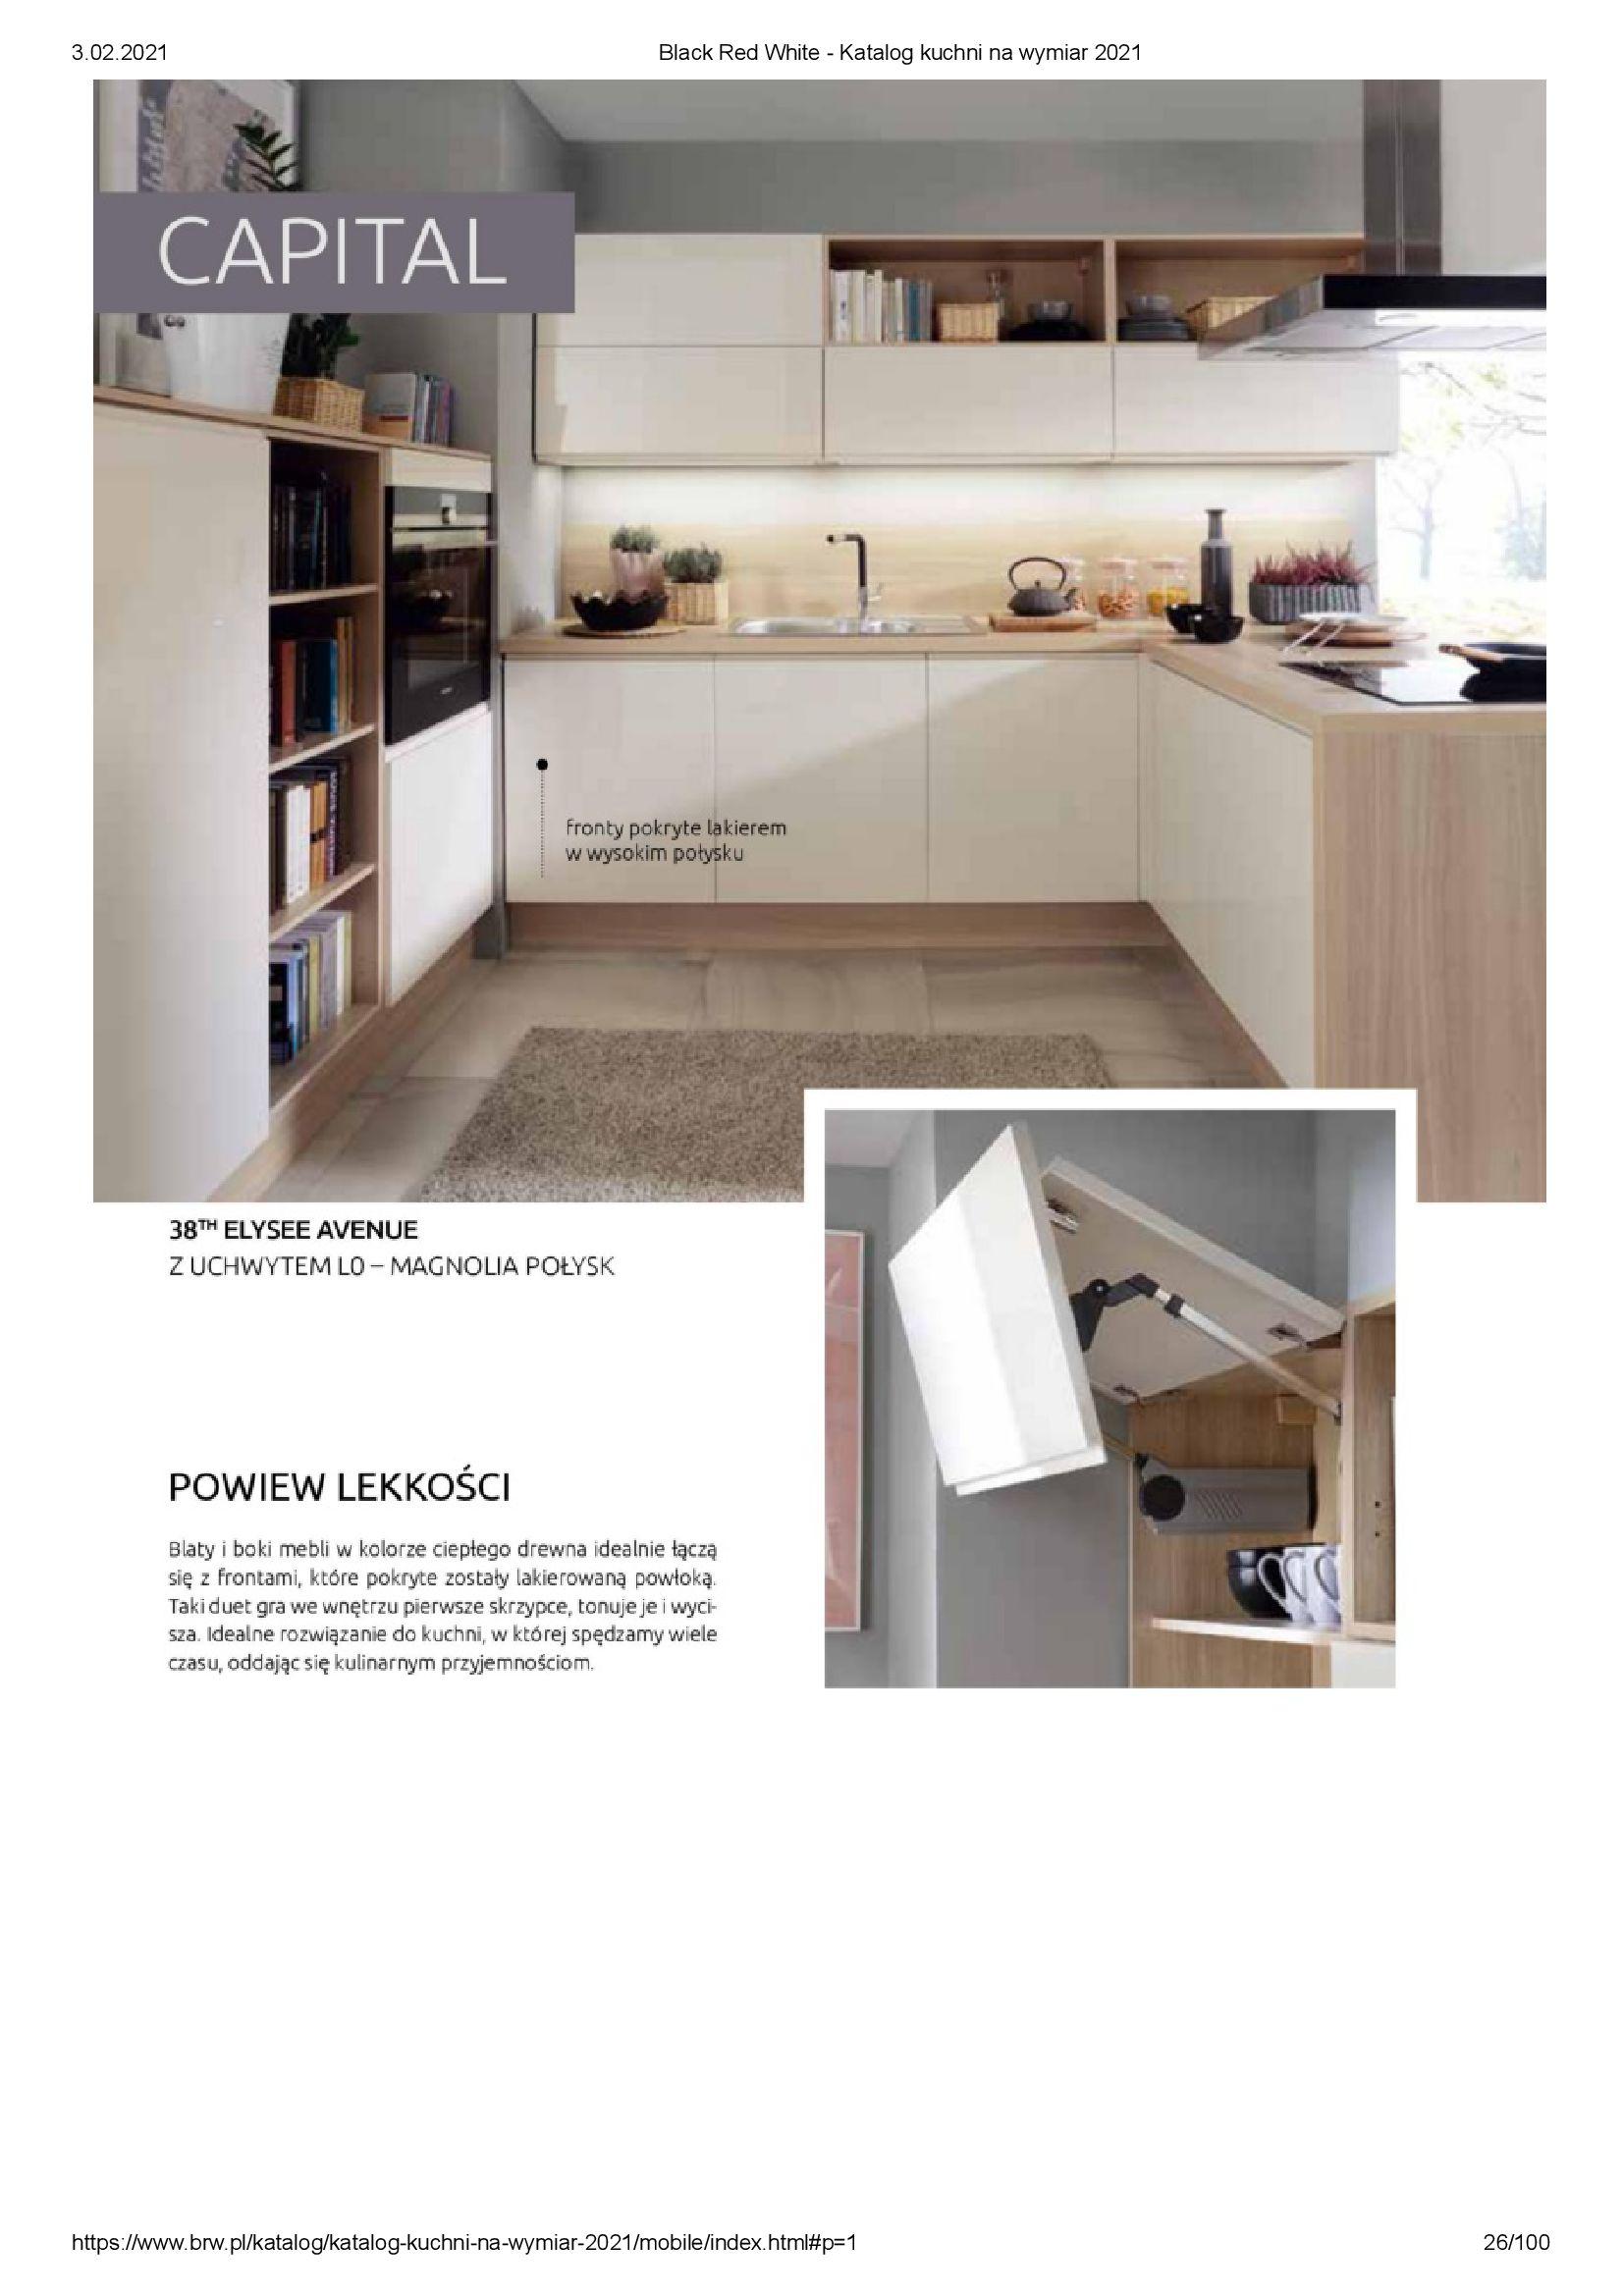 Gazetka Black Red White: Katalog - Kuchnie na wymiar Senso Kitchens 2021 2021-01-01 page-26